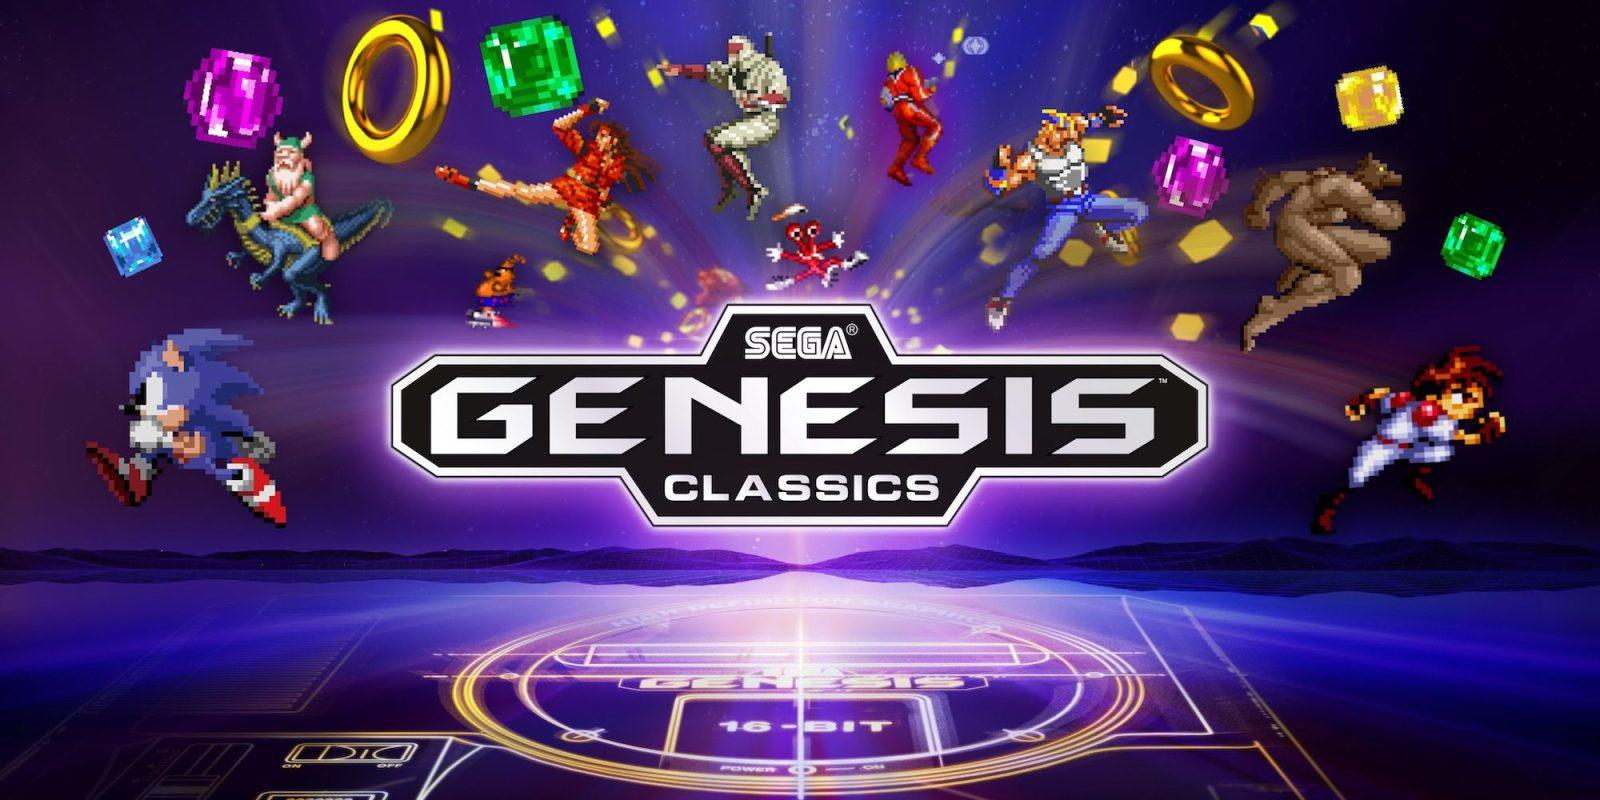 Today's Best Game Deals: SEGA Genesis Classics $15, Madden NFL 20 $30, more